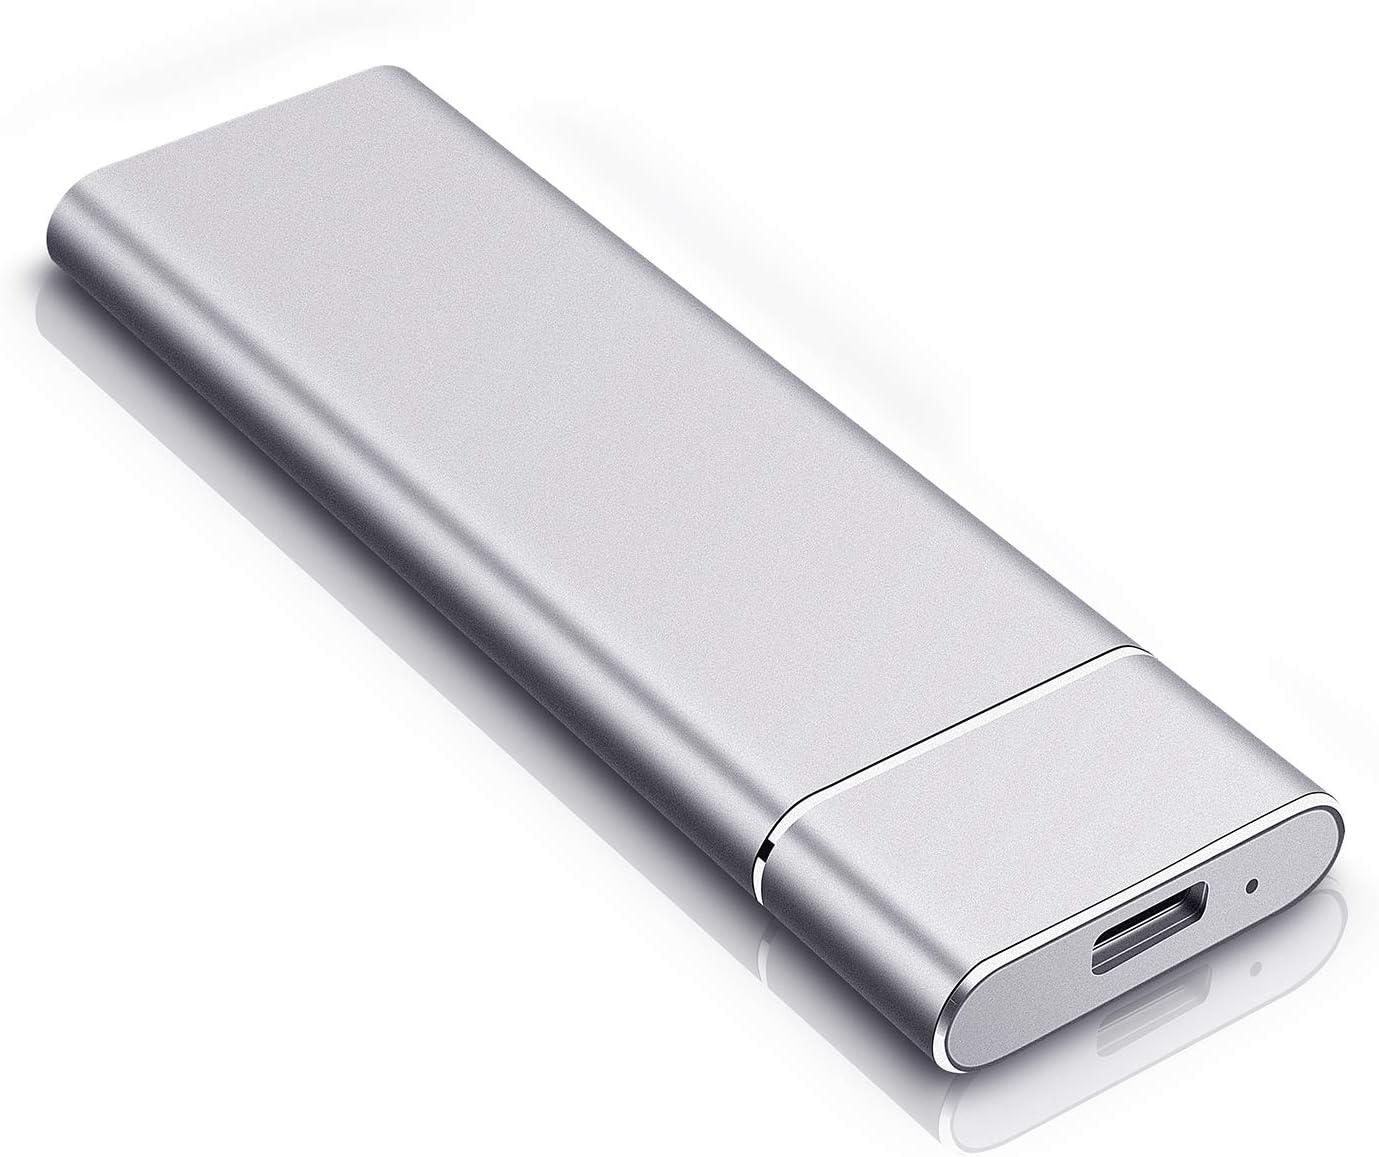 External Hard Drive, Portable Hard Drive External HDD Durable USB 3.1 for PC, Mac, Desktop, Laptop (2TB, Silver)